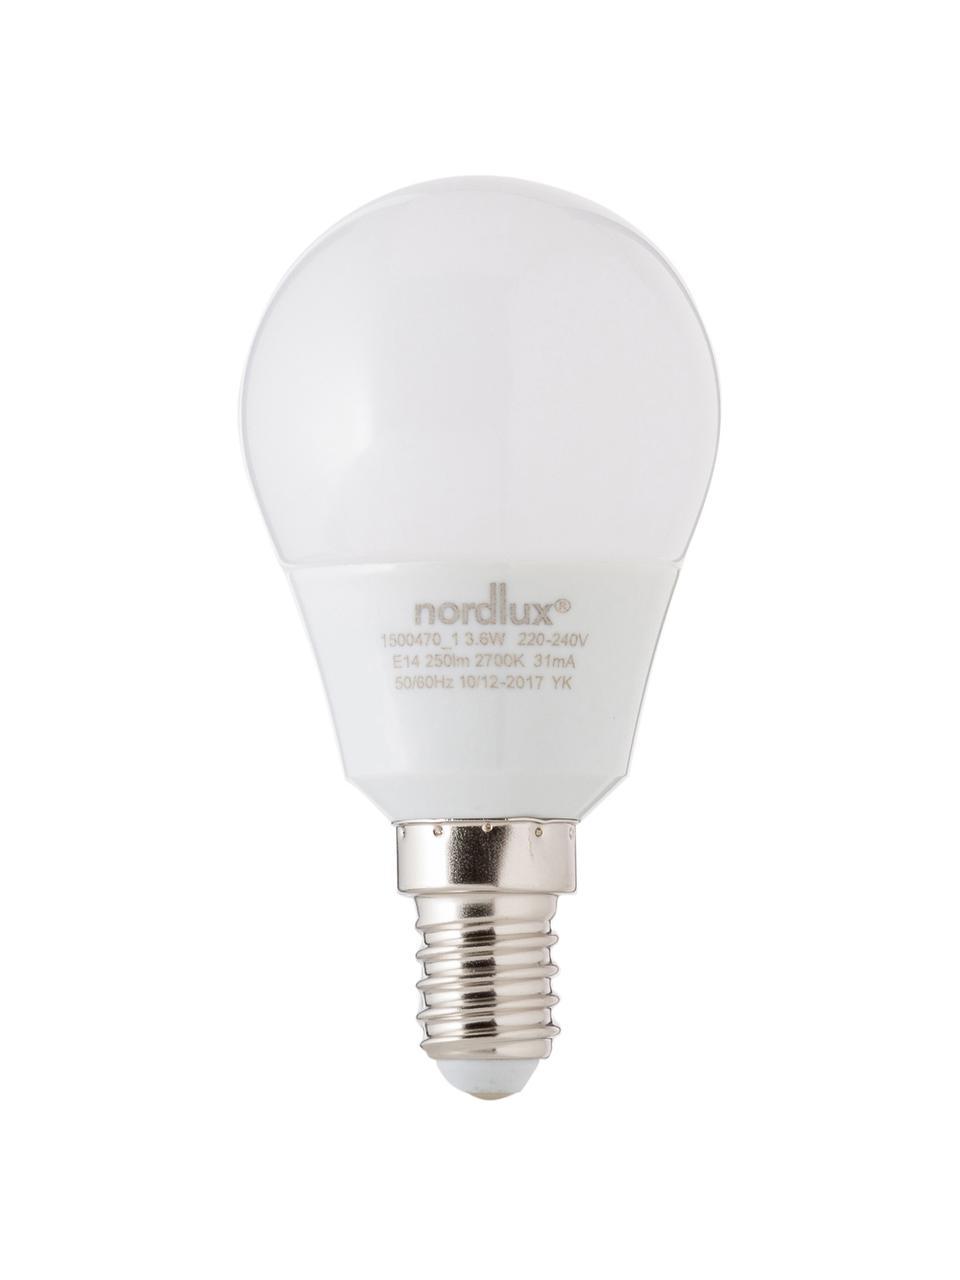 E14 Leuchtmittel, 4W, warmweiß, 1 Stück, Leuchtmittelschirm: Opalglas, Leuchtmittelfassung: Aluminium, Weiß, Ø 5 x H 9 cm